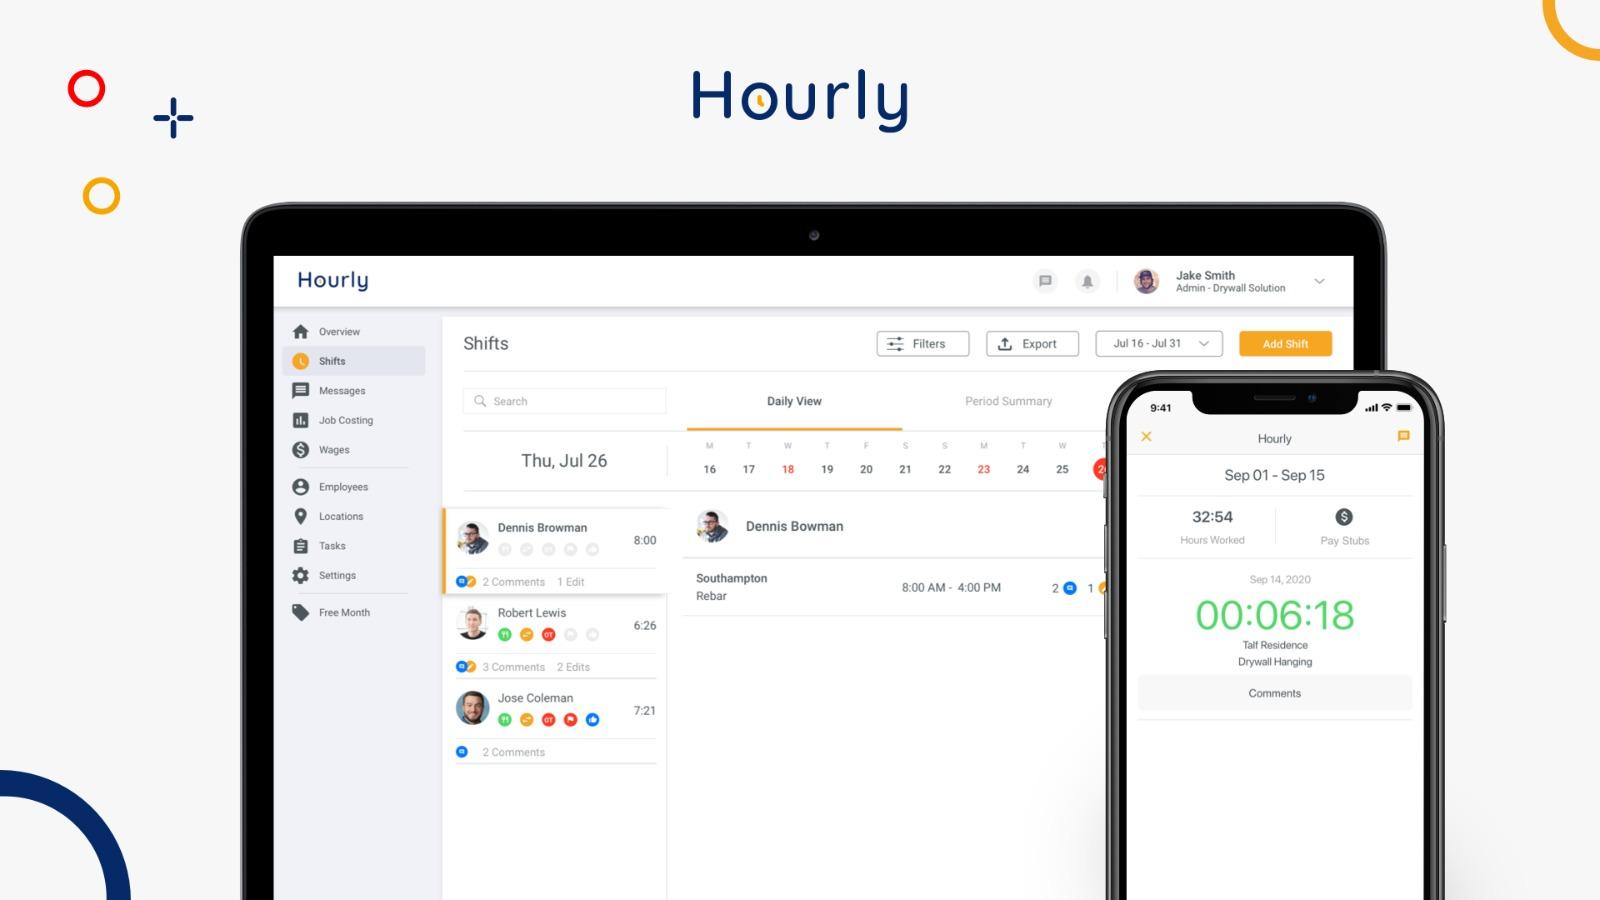 Hourly App Employer's View: Employee Lookup